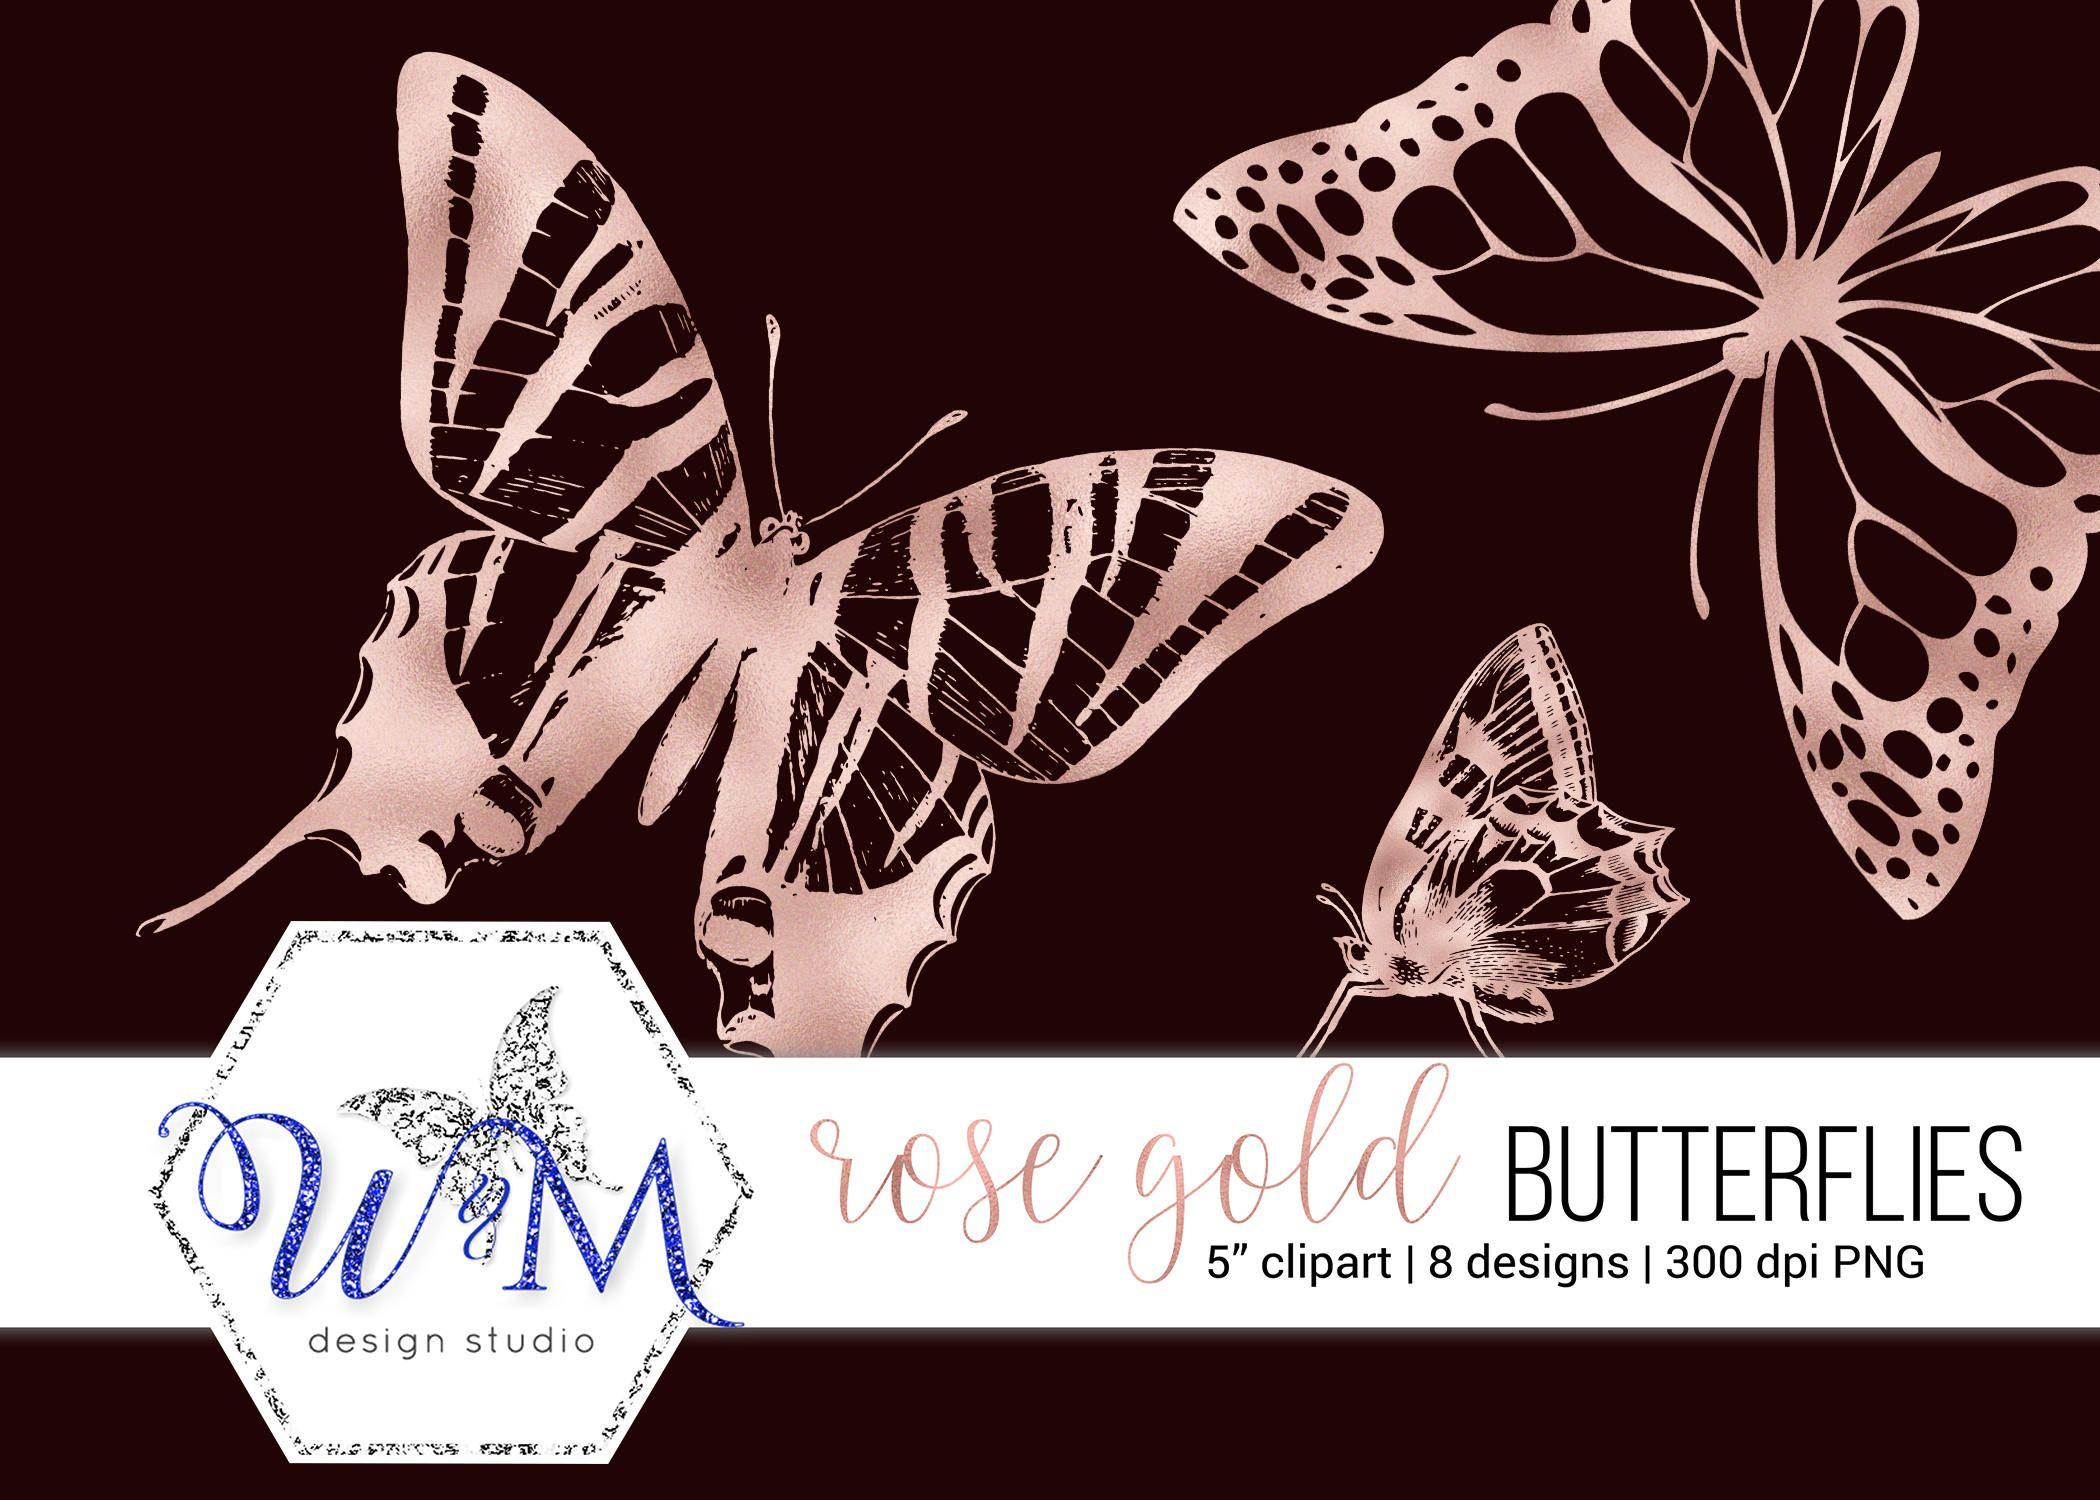 Rose Gold Butterfly Clipart Rose Gold Butterflies Png Etsy Butterfly Clip Art Rose Gold Butterfly Clip Art